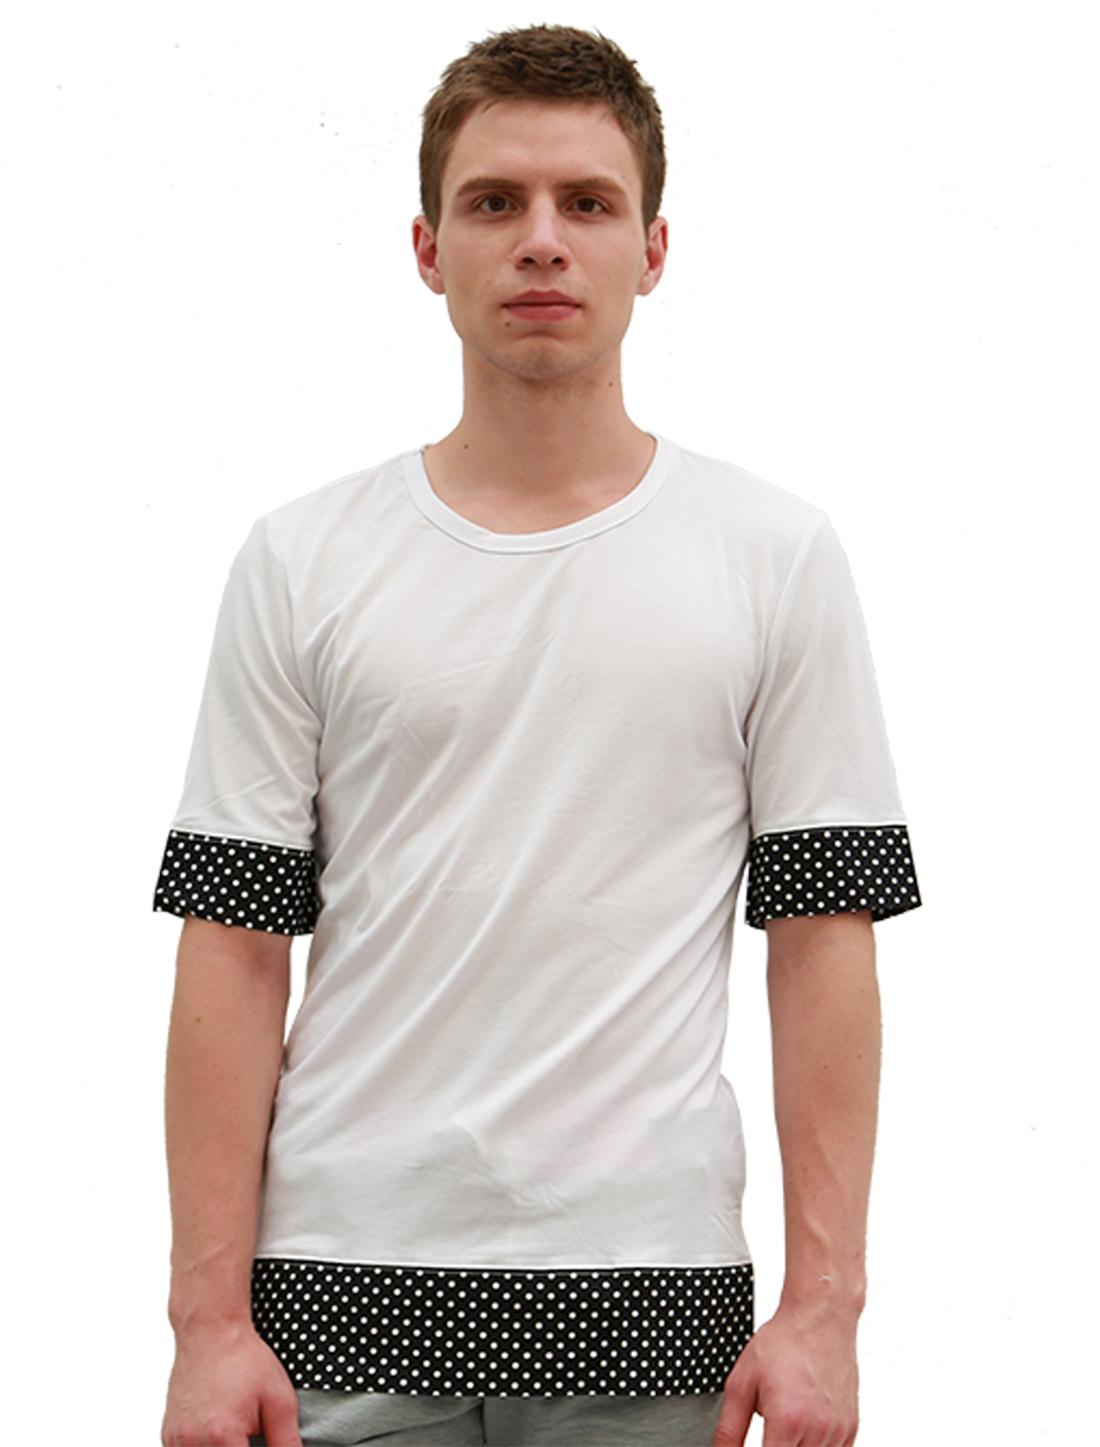 Men Short Sleeves Dotted Paneled Trim Tee White S